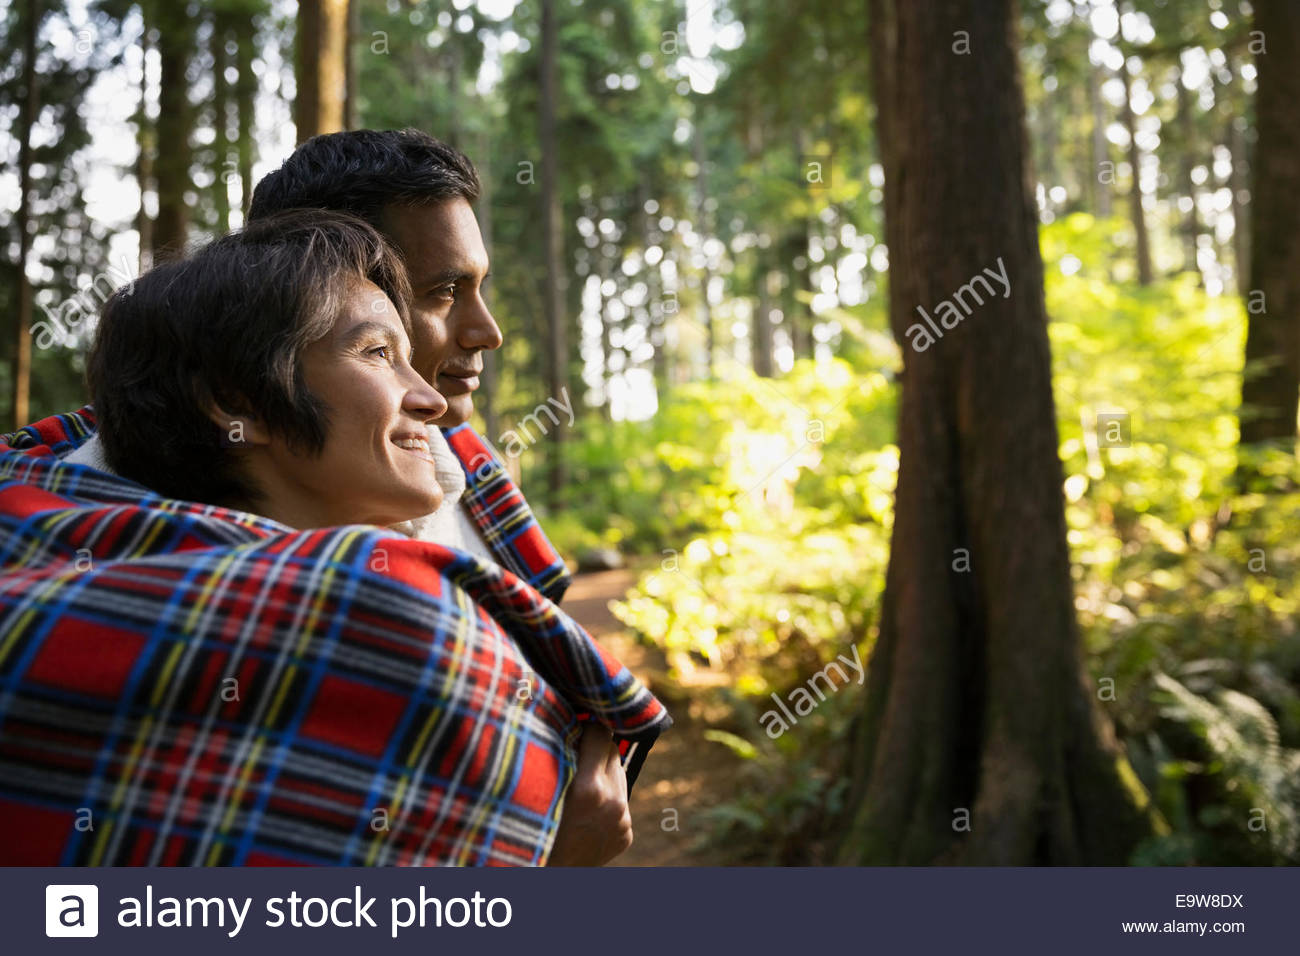 Couple blanket in woods Photo Stock